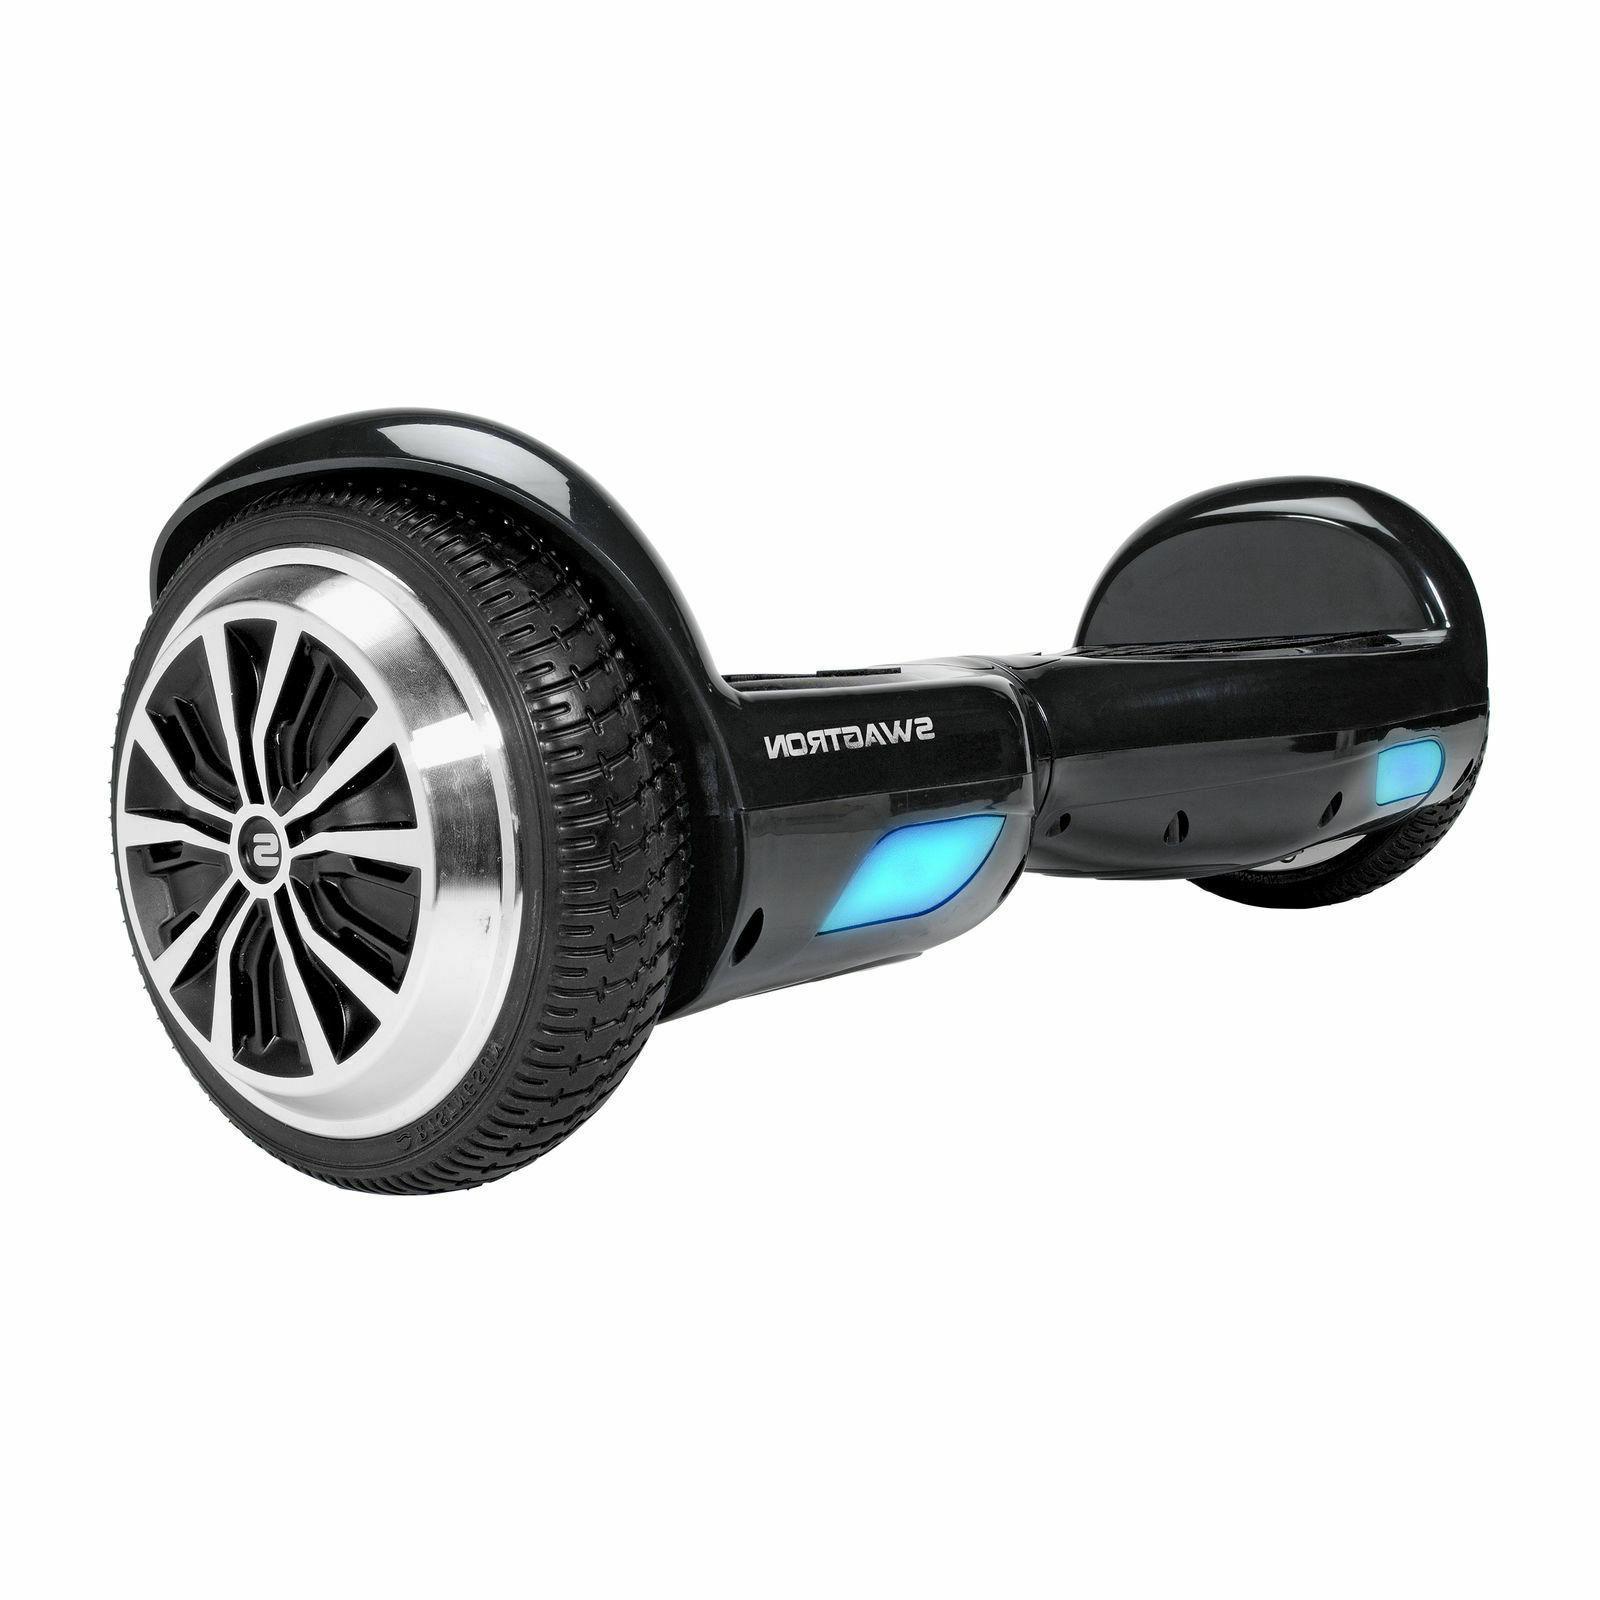 refurbished t881 lithium free ul2272 hoverboard balance